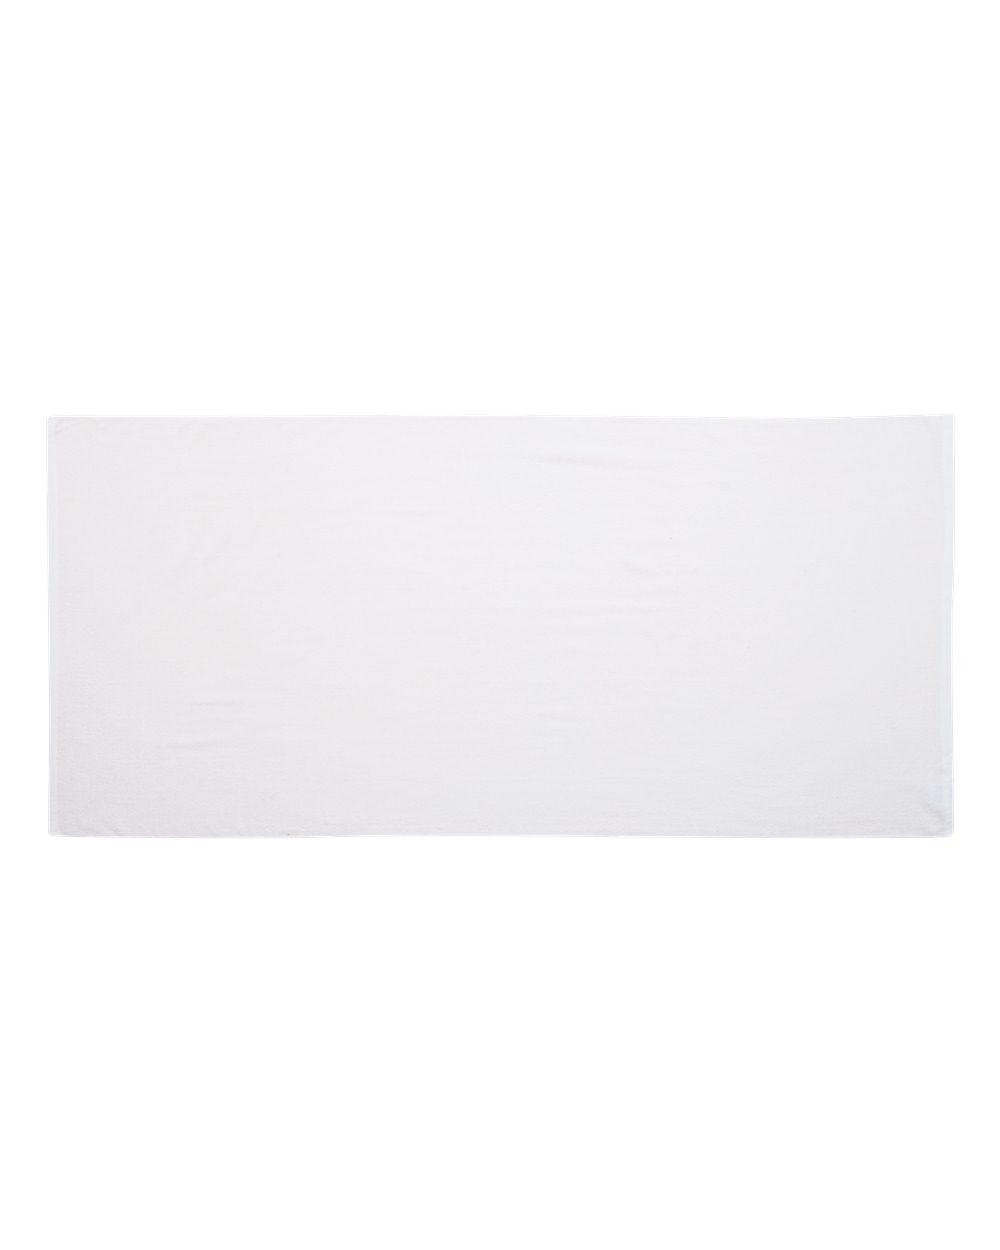 Carmel Towel Company 2858 - Terry Beach Towel